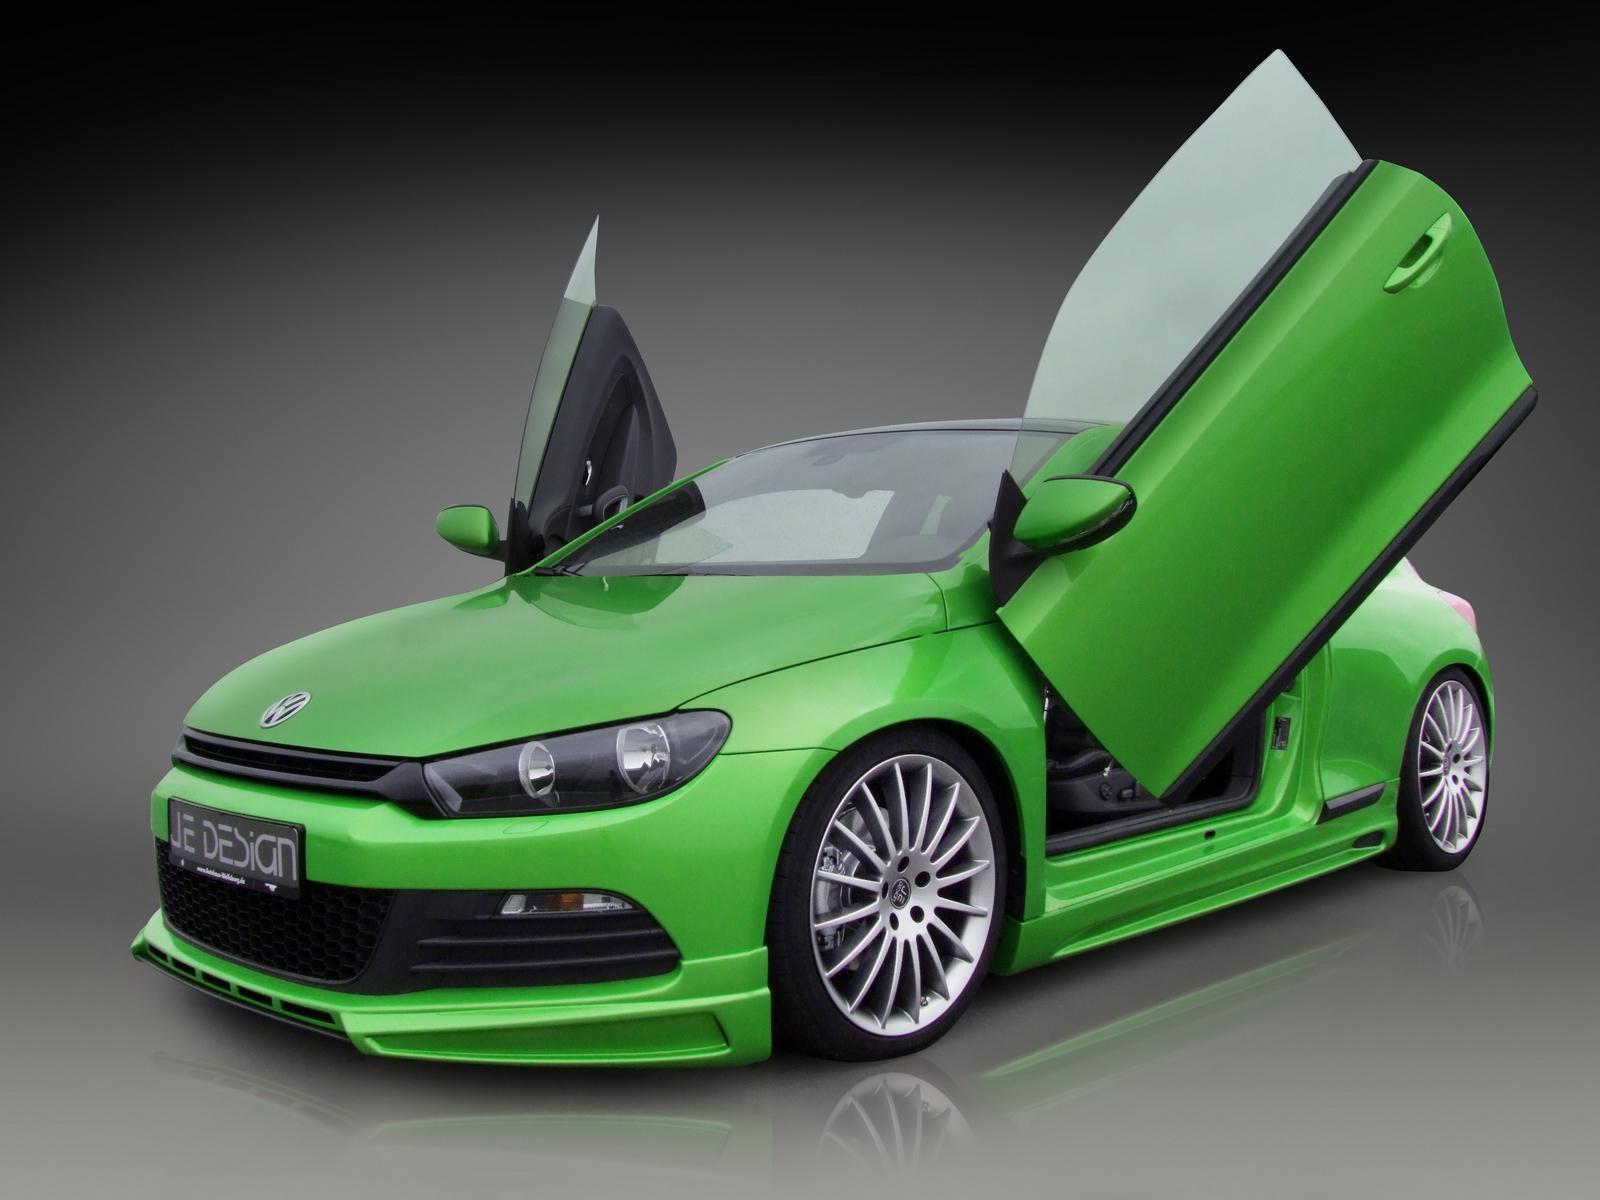 Cars HD Wallpapers Volkswagen Scirocco Tuning Car HD 1600x1200